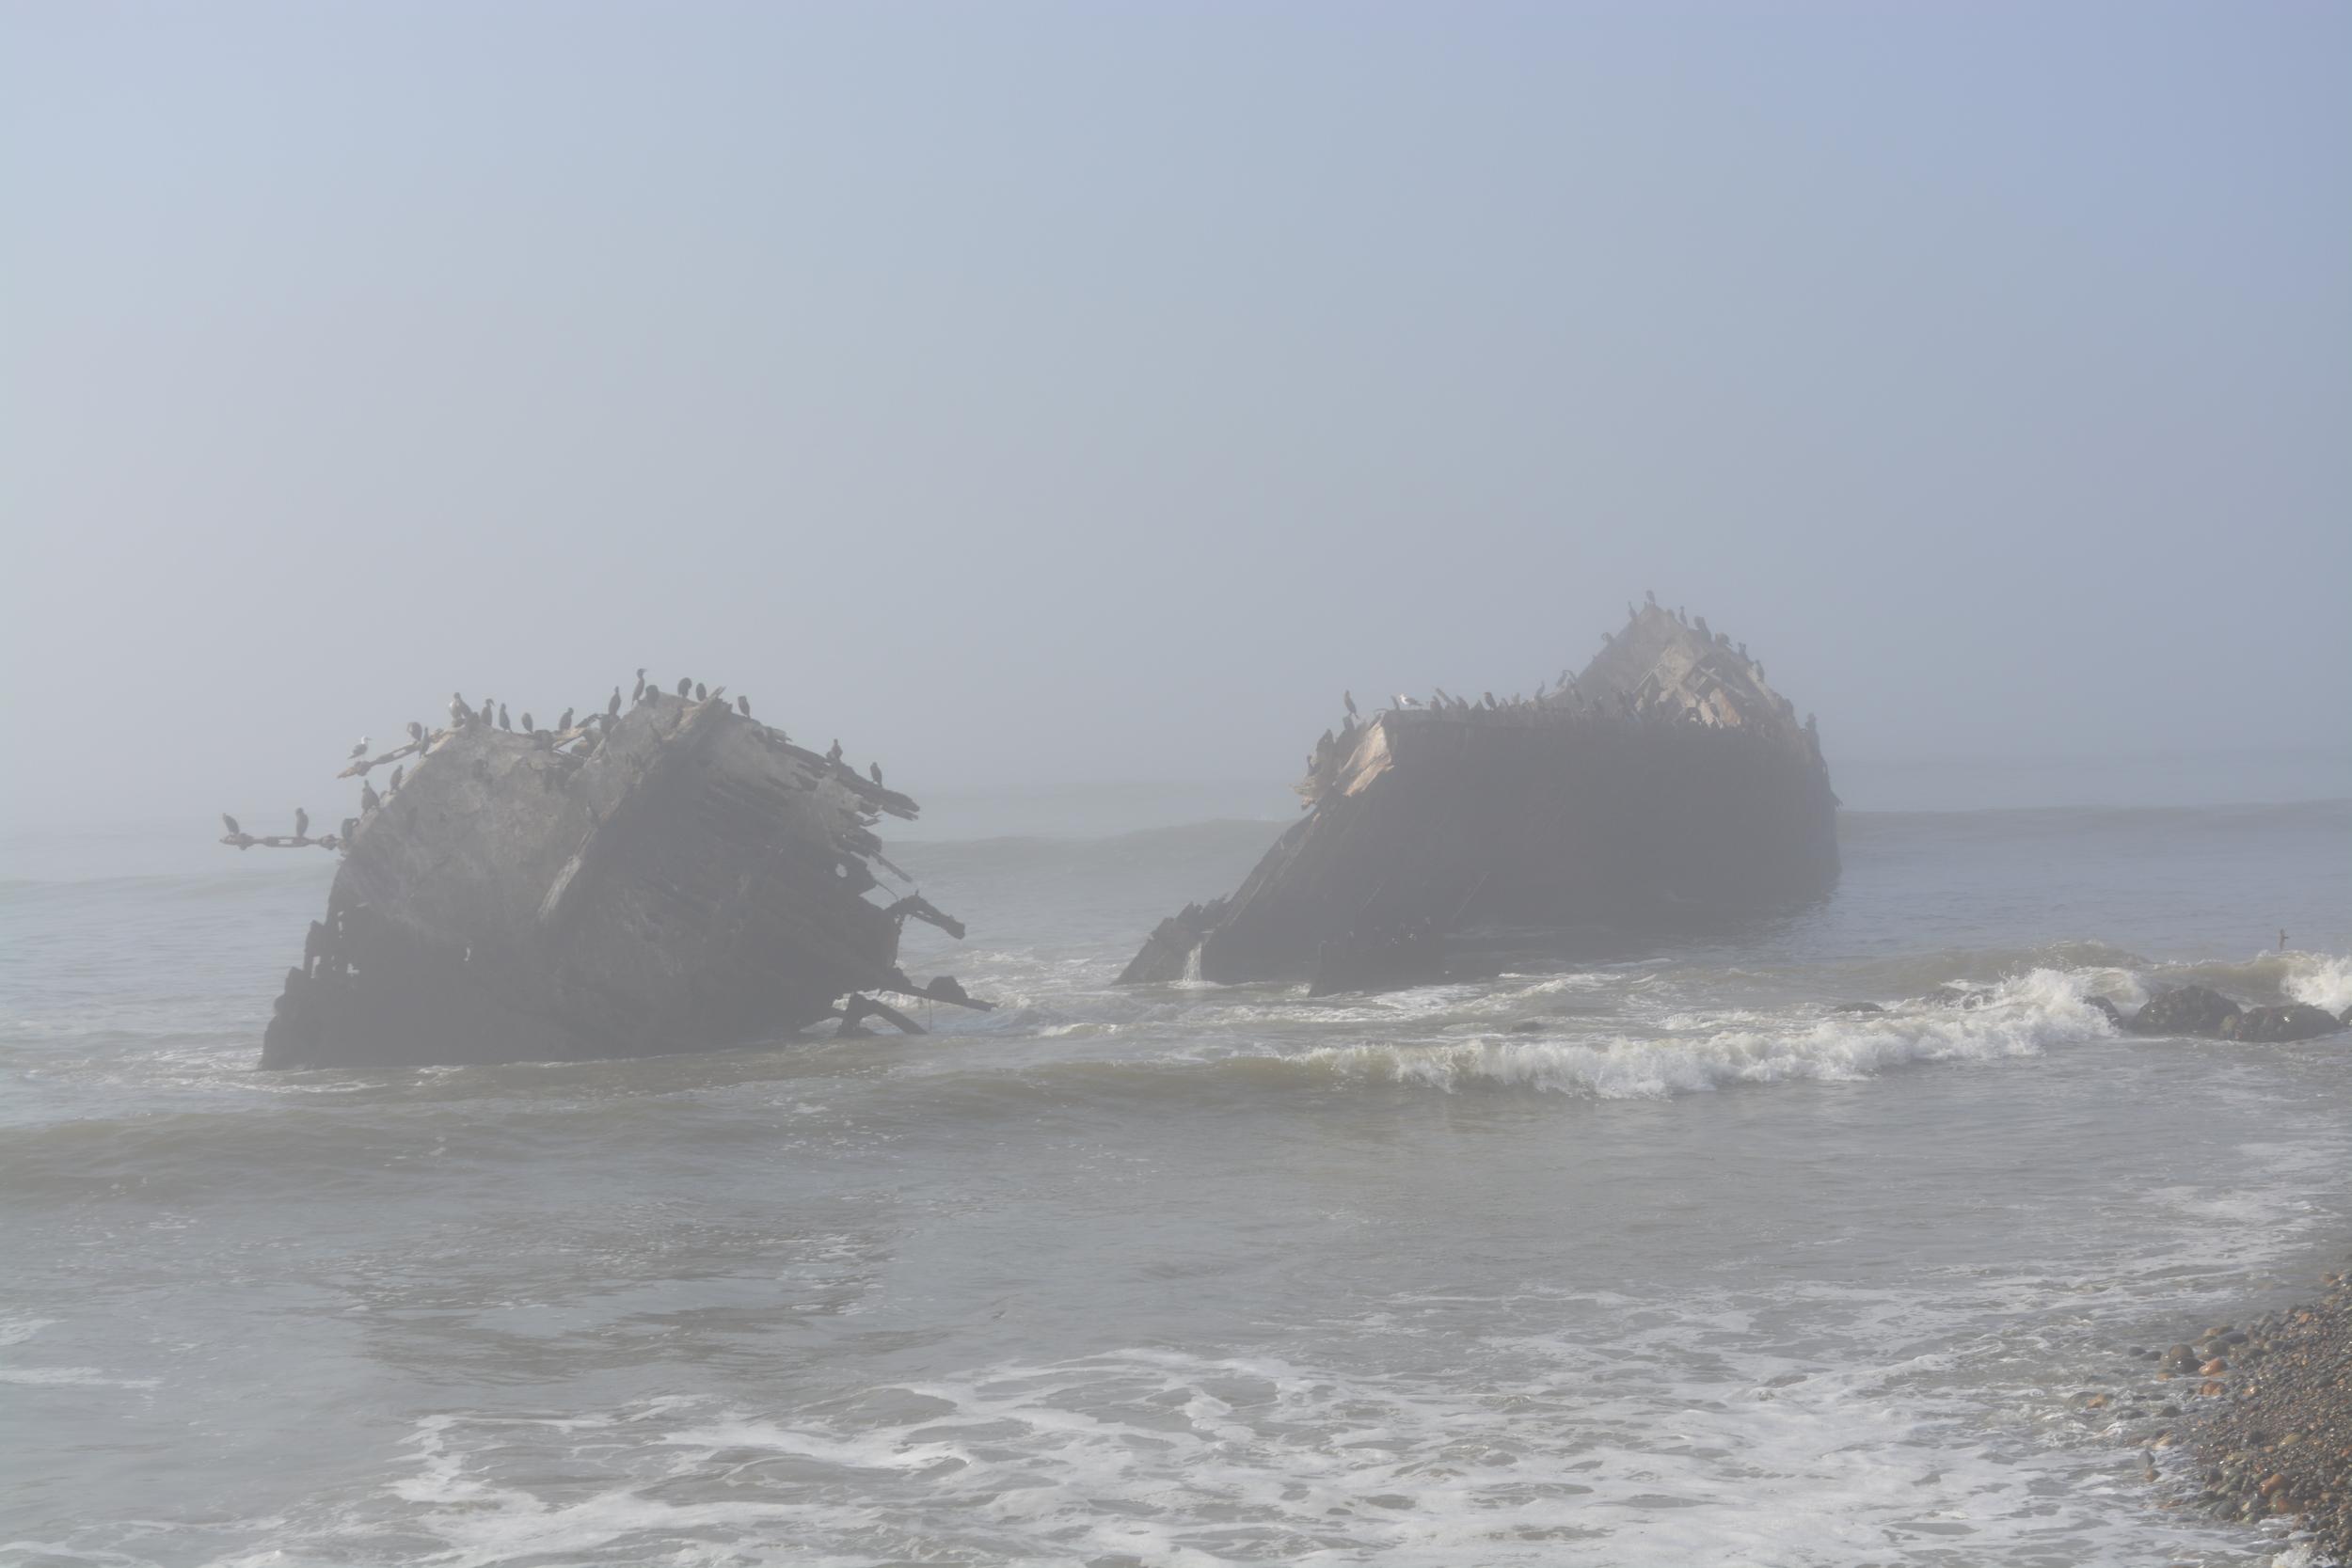 Baja California 10-5-13 Shipwrecks Surfing Adventure Ocean Experience Surf School San Diego (30).JPG